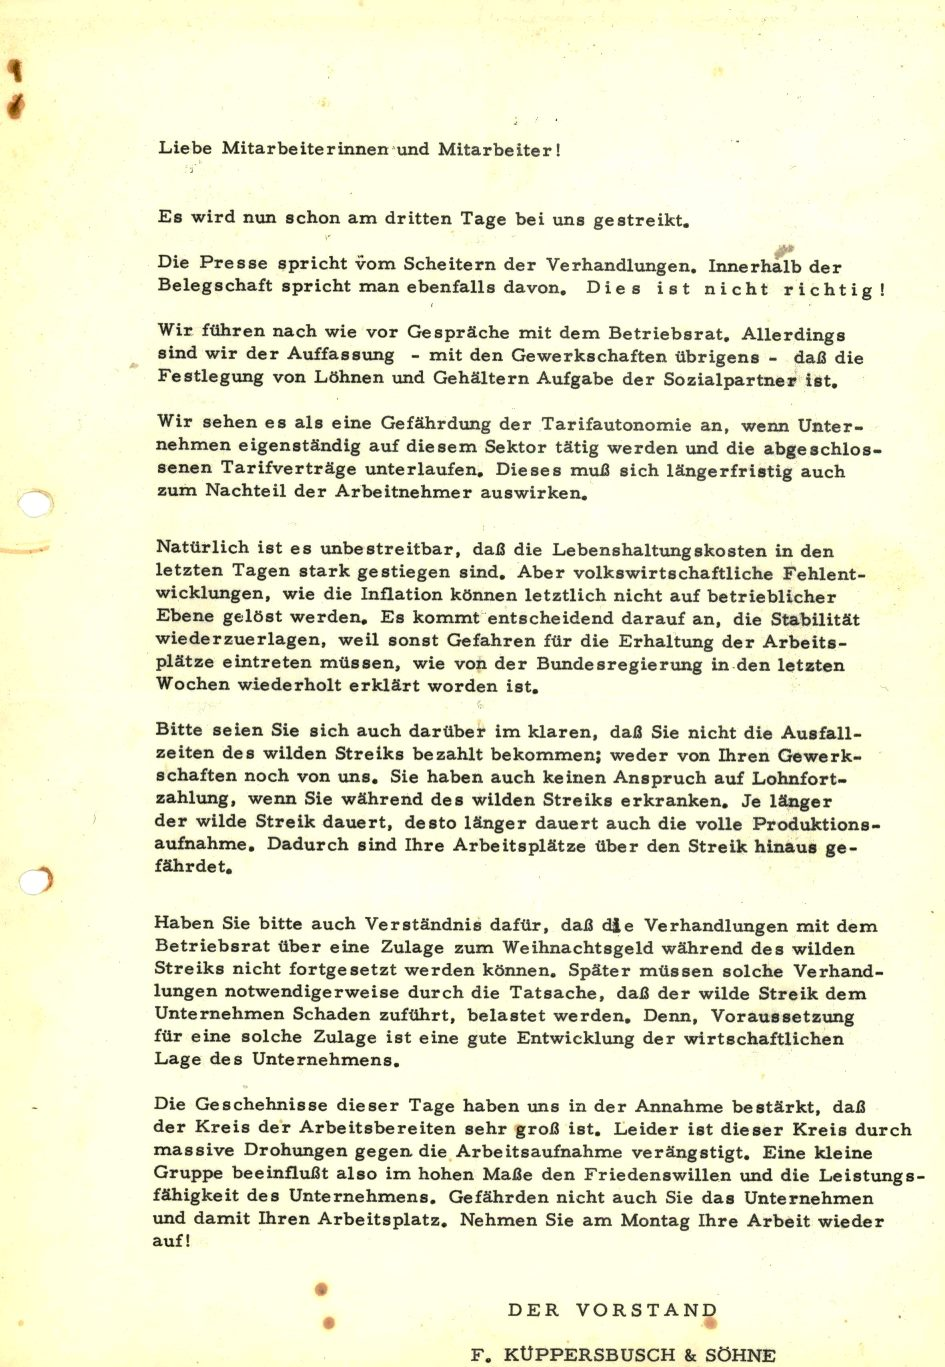 AEG_Vorstand_1973_01